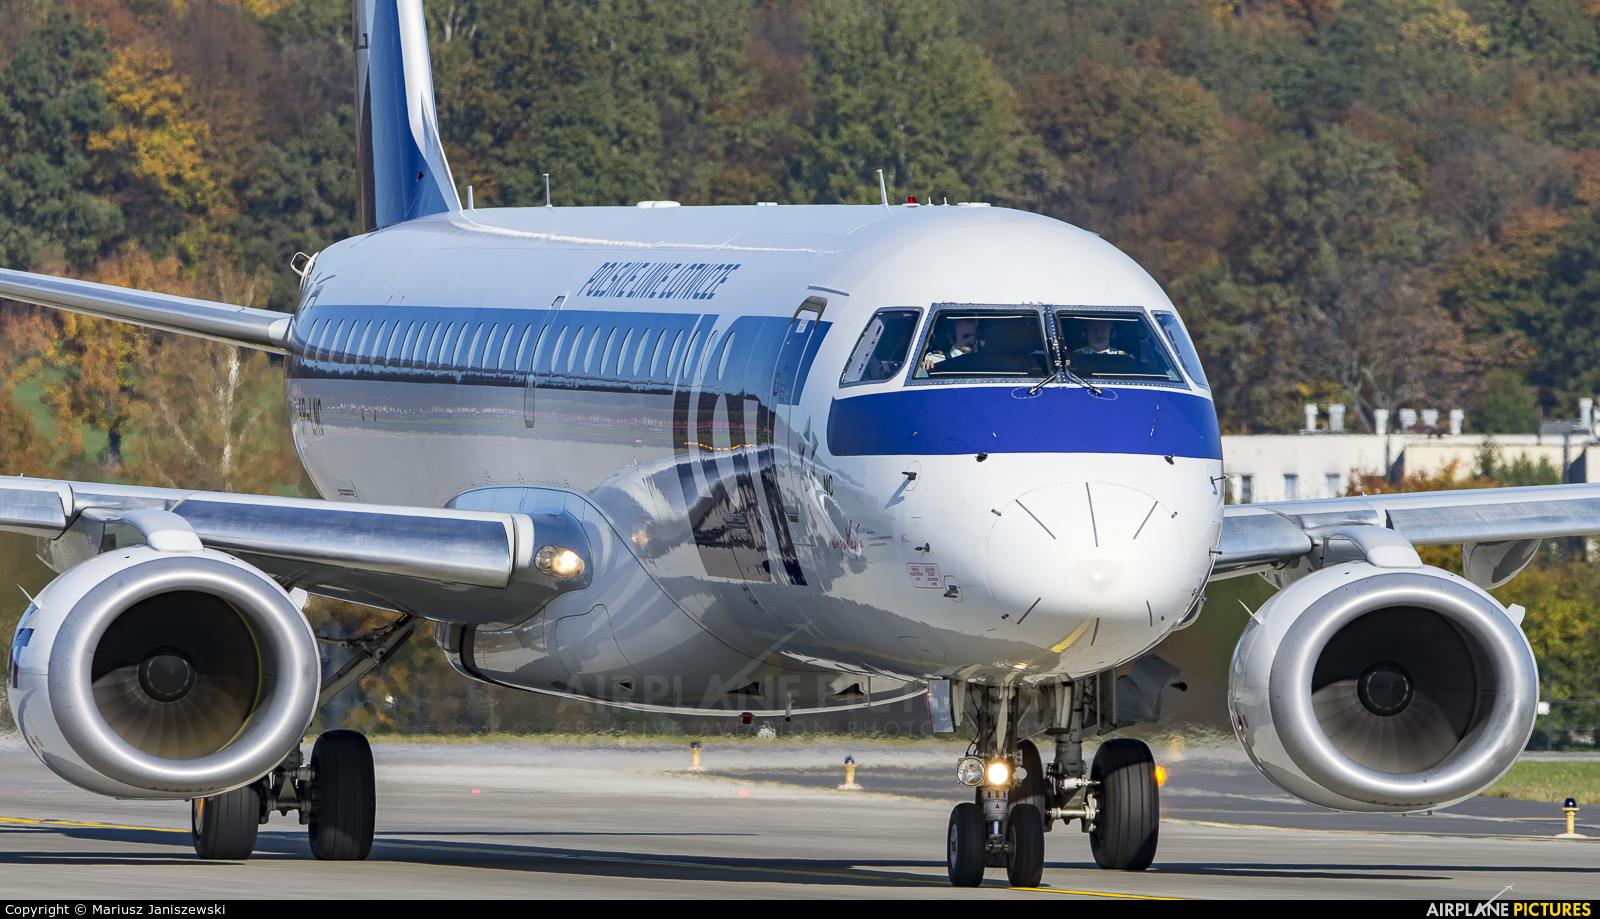 LOT - Polish Airlines SP-LNC aircraft at Kraków - John Paul II Intl